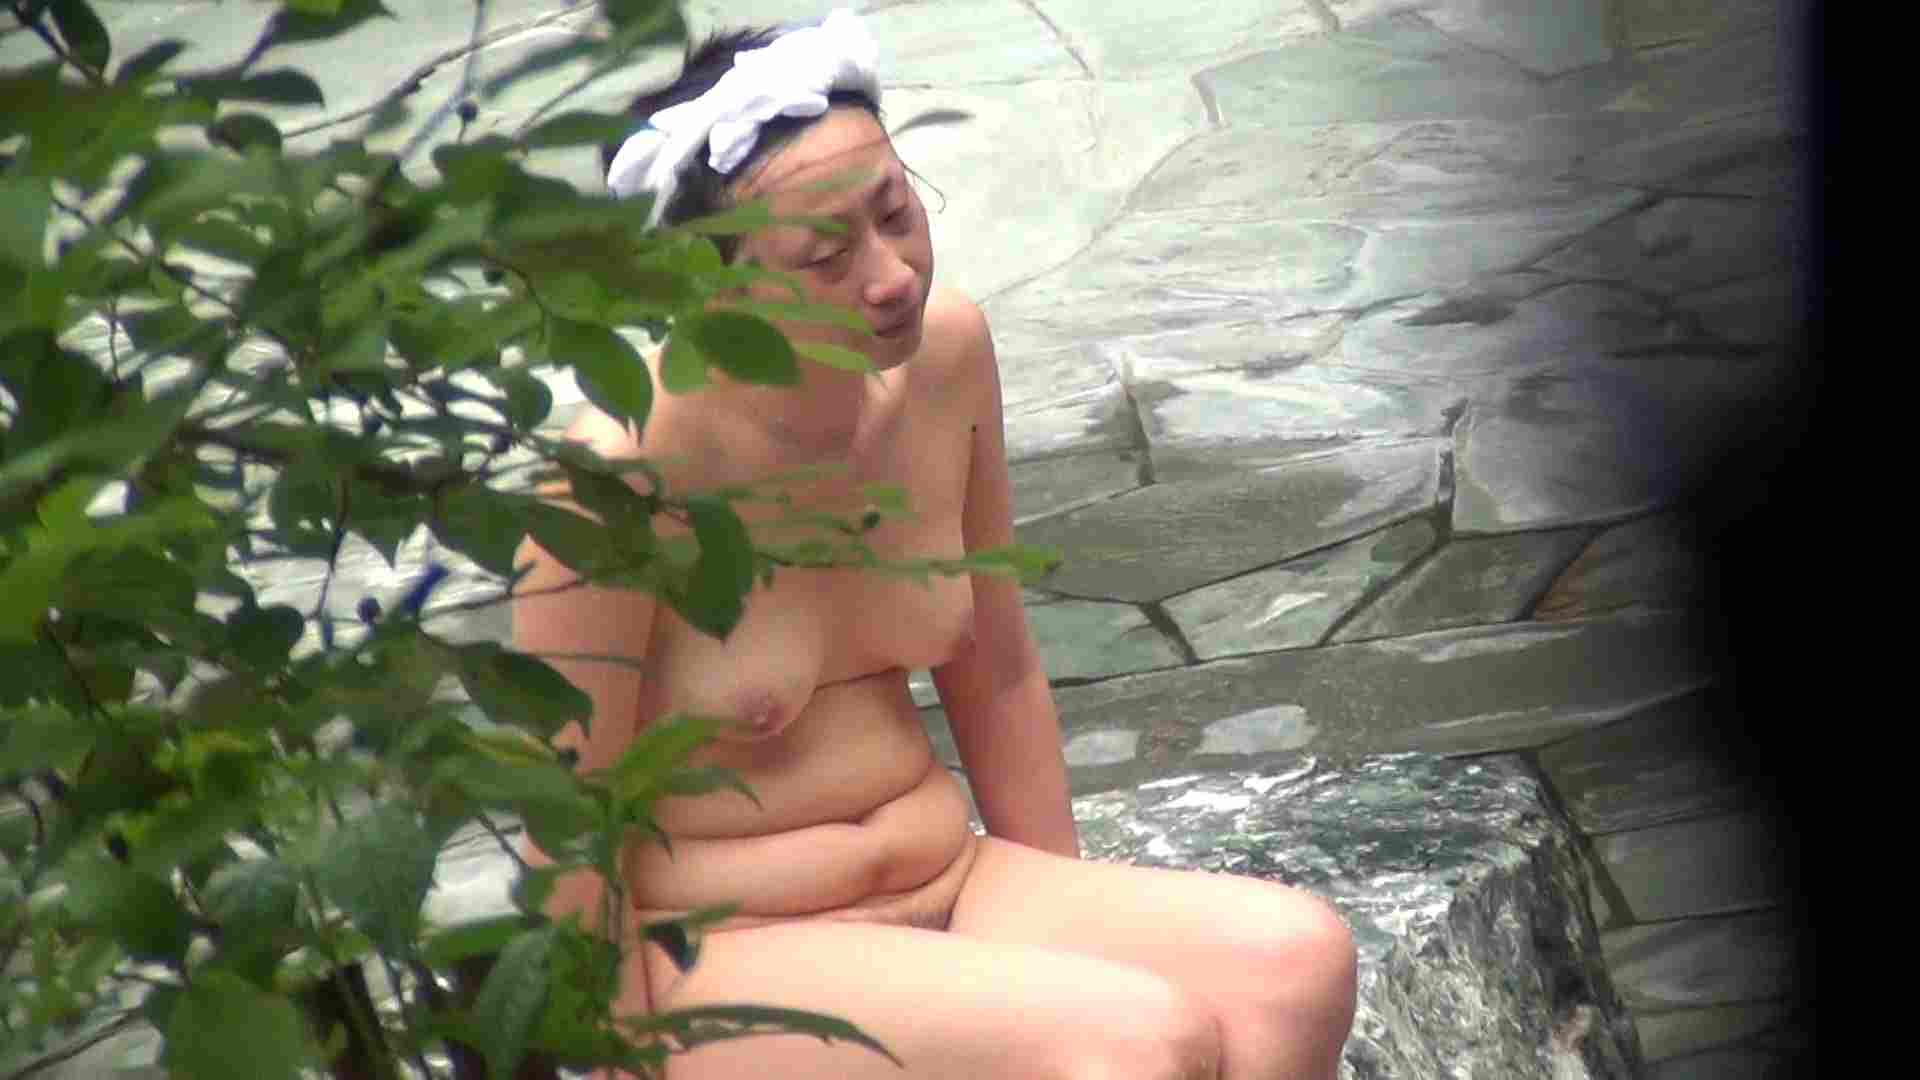 Vol.80 出産経験済みの弛んだ肉体と大胆すぎるアングル 美女のボディ  54PIX 12